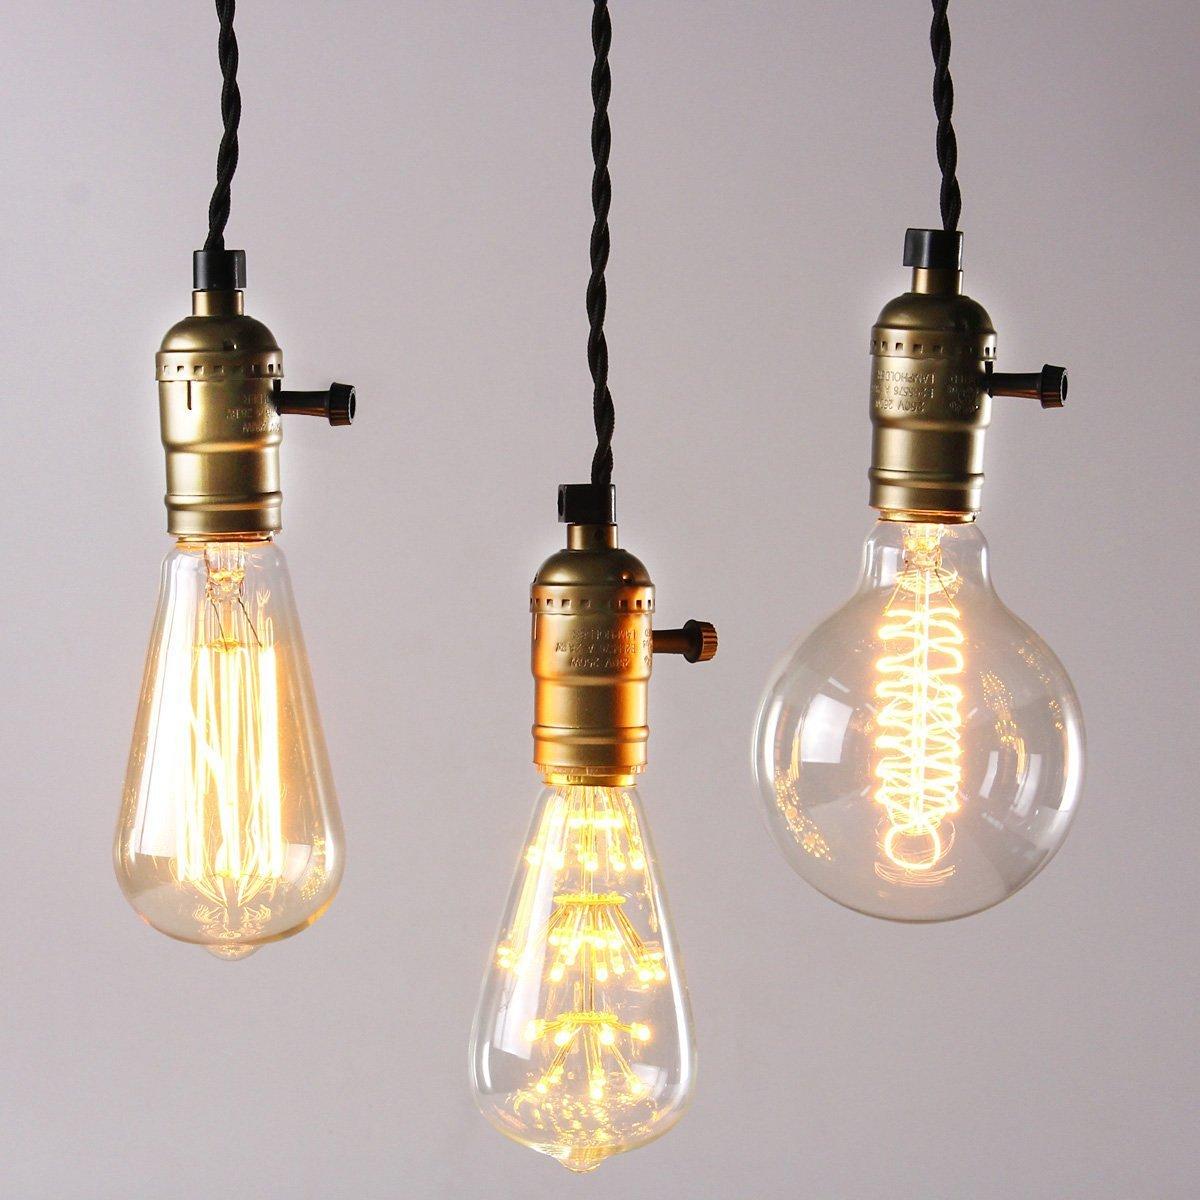 KINGSO Vintage Retro Hängeleuchte Edison Antike Pendelleuchte DIY ...